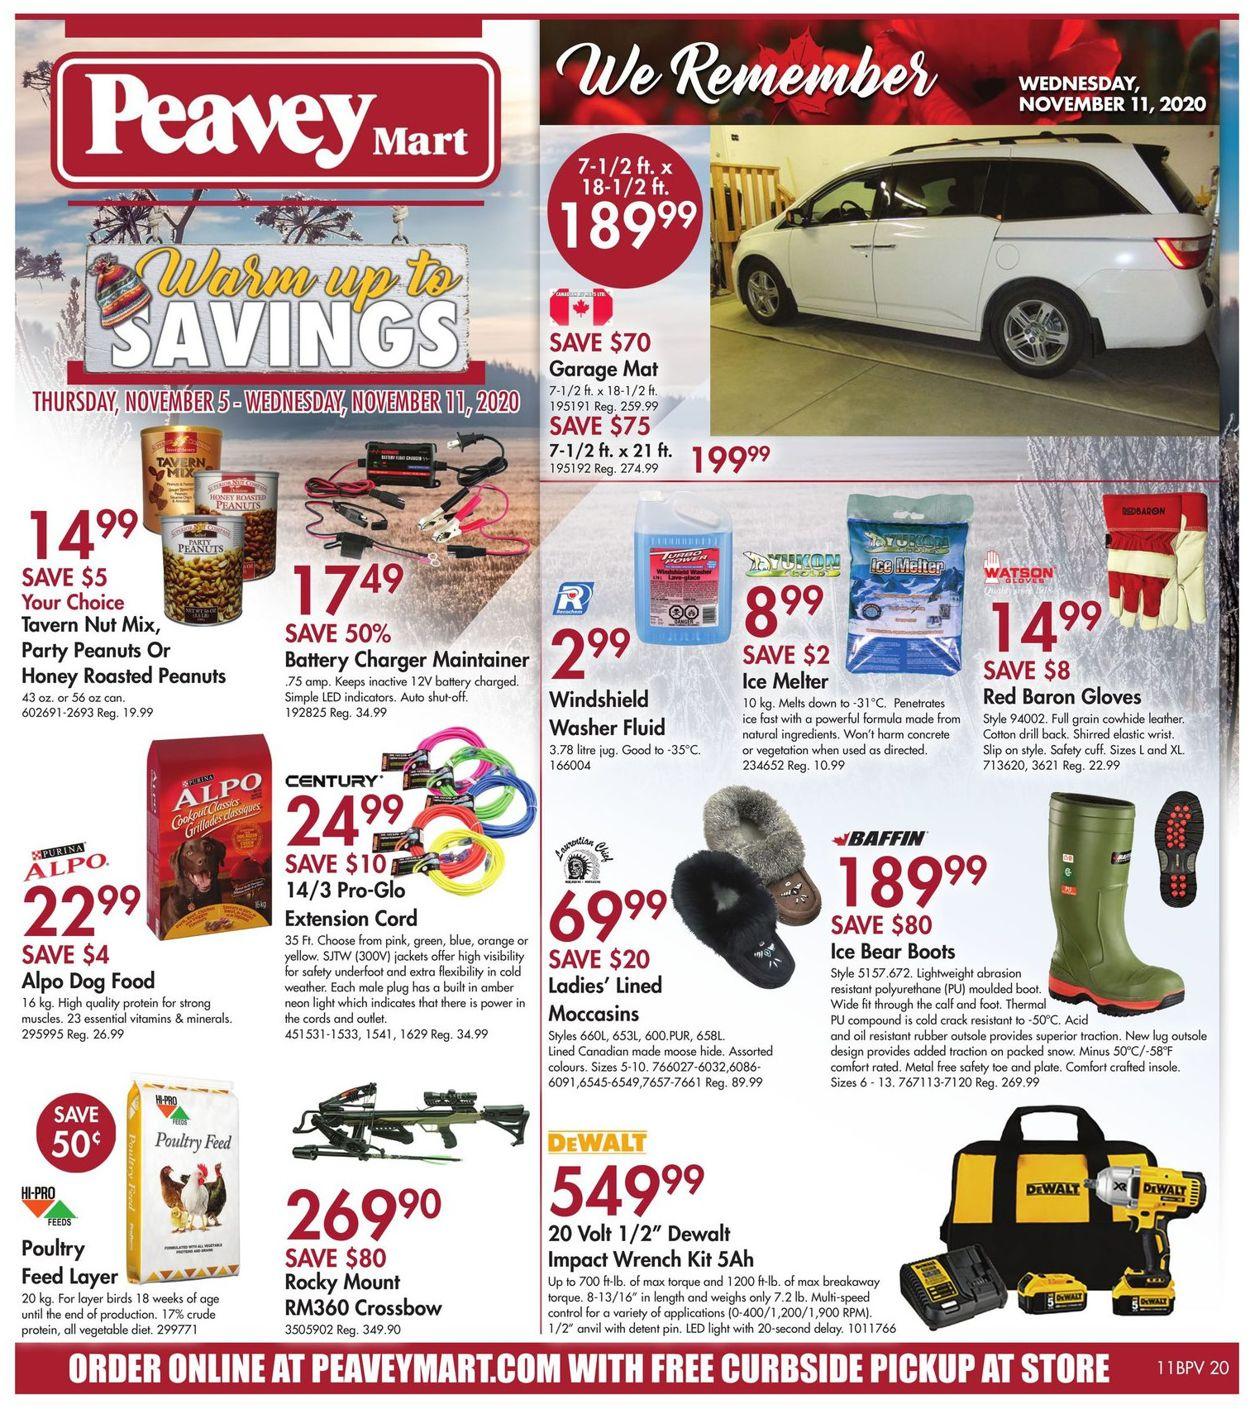 Peavey Mart - Christmas 2020 Flyer - 11/05-11/11/2020